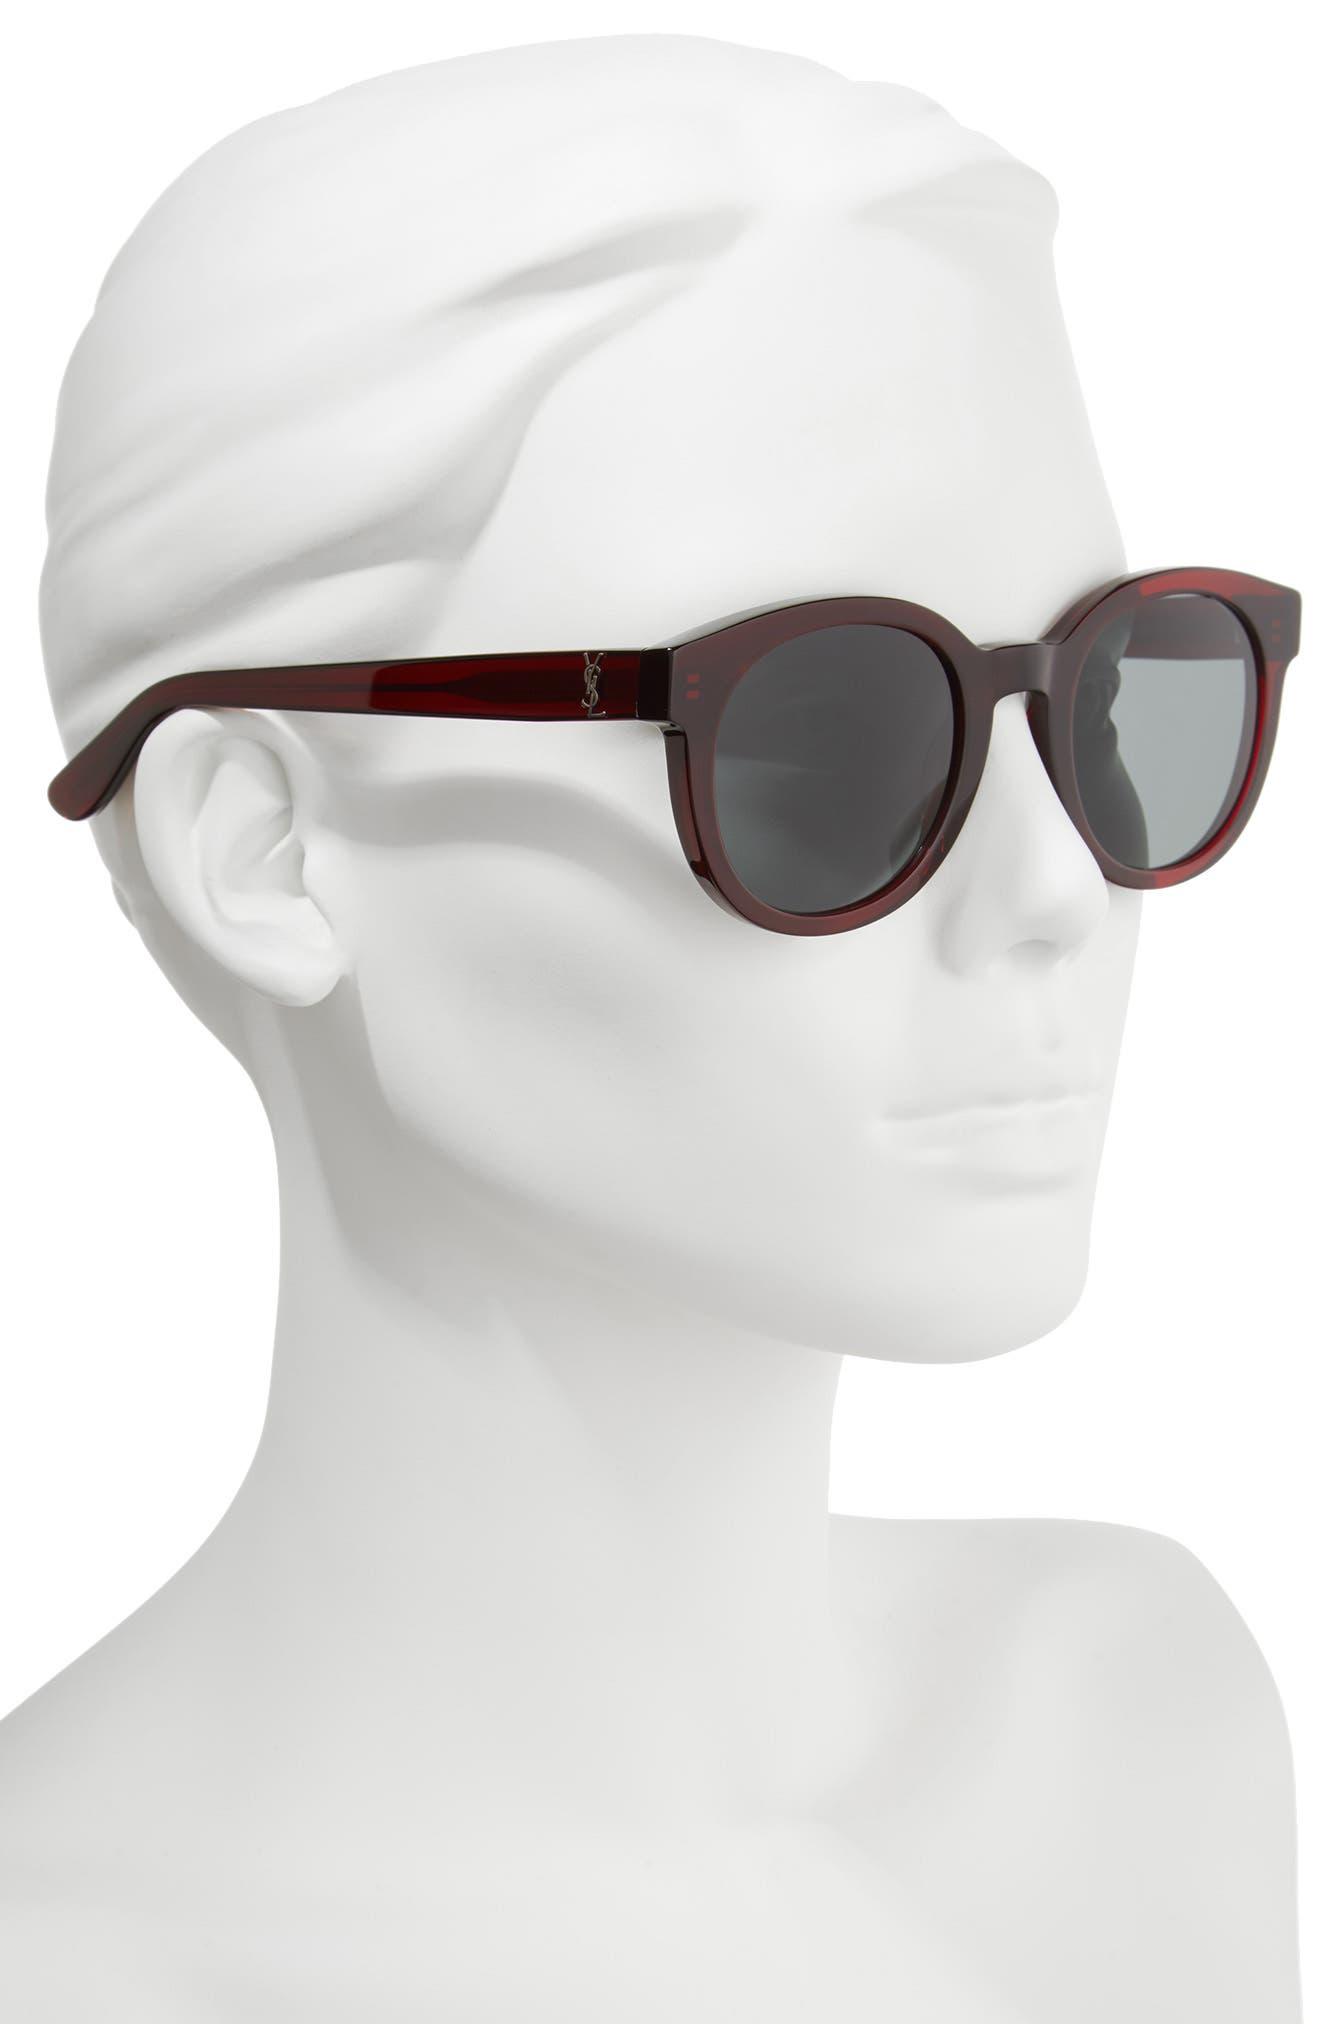 51mm Round Sunglasses,                             Alternate thumbnail 2, color,                             Burgundy